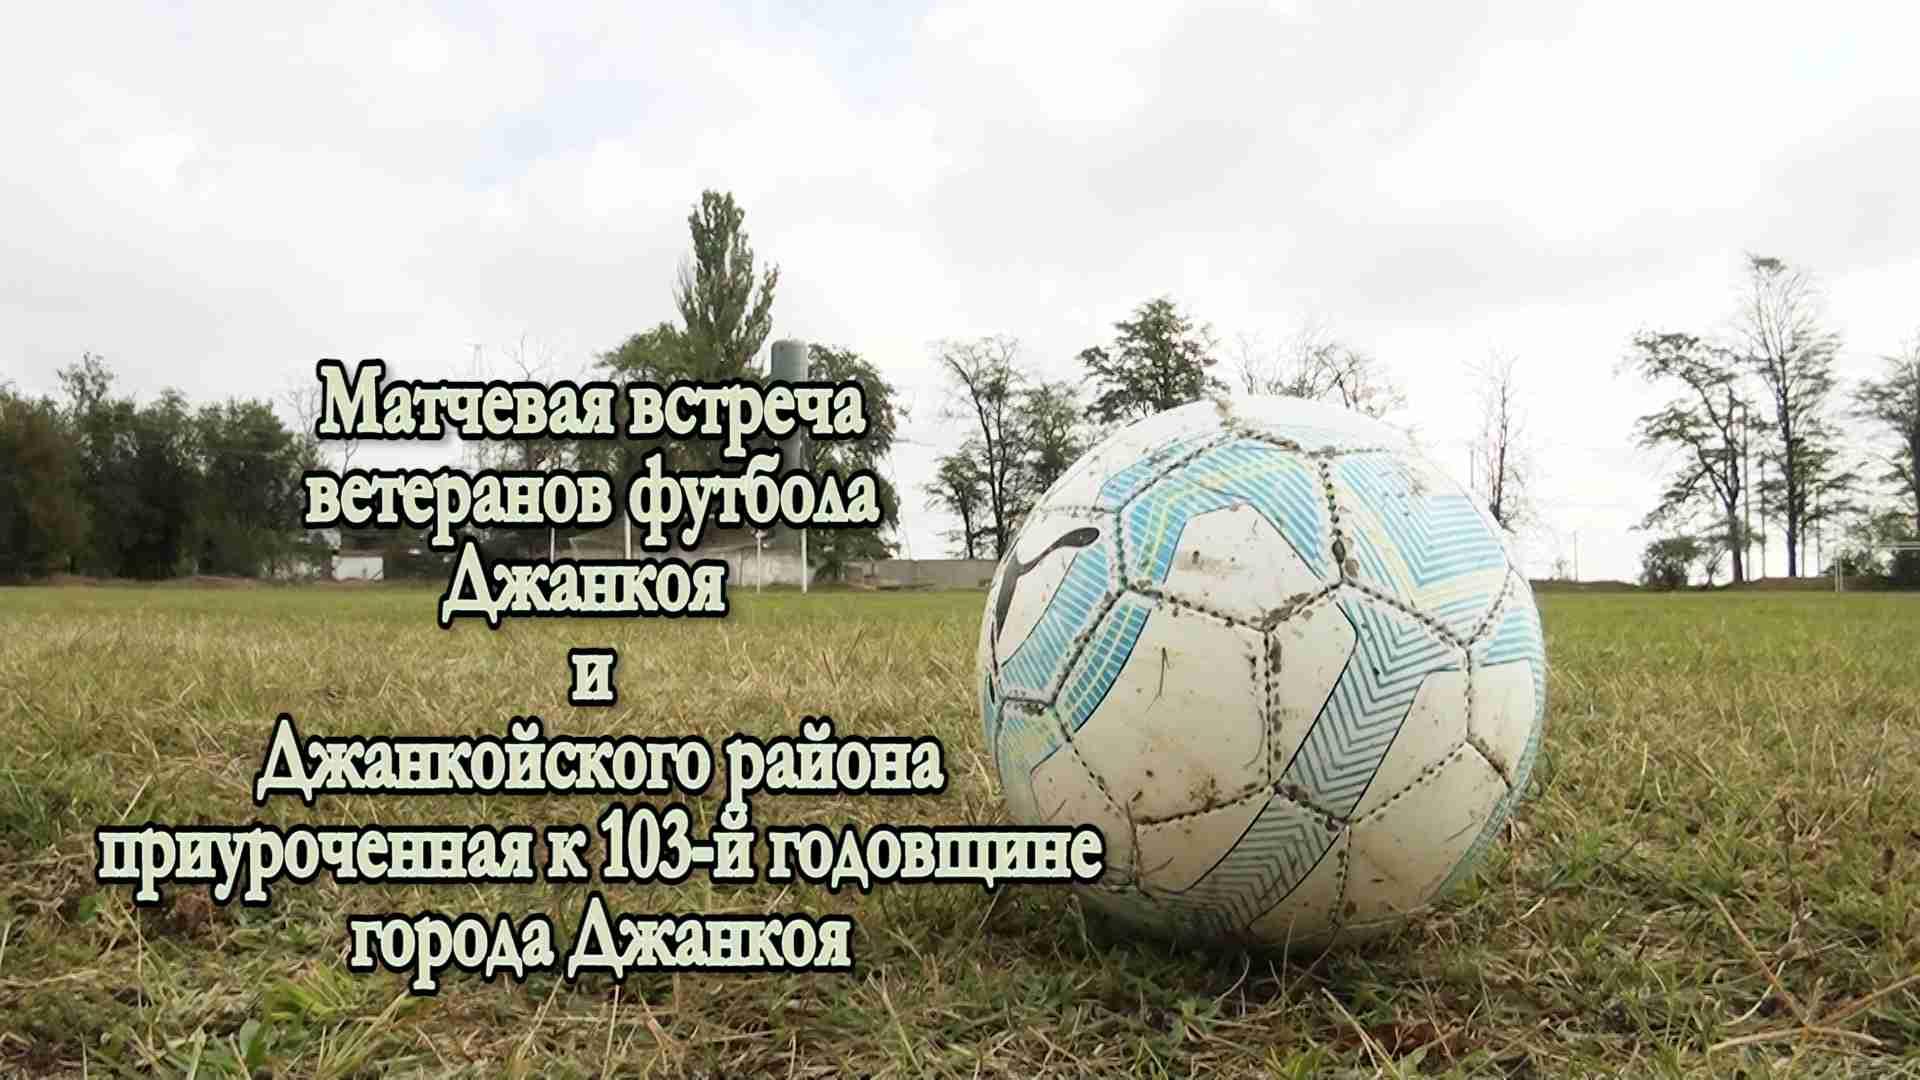 match veterany futbola dzhankoja i dzhankojskogo rajona - Со счетом 3:1 сыграли ветераны футбола Джанкоя и Джанкойского района